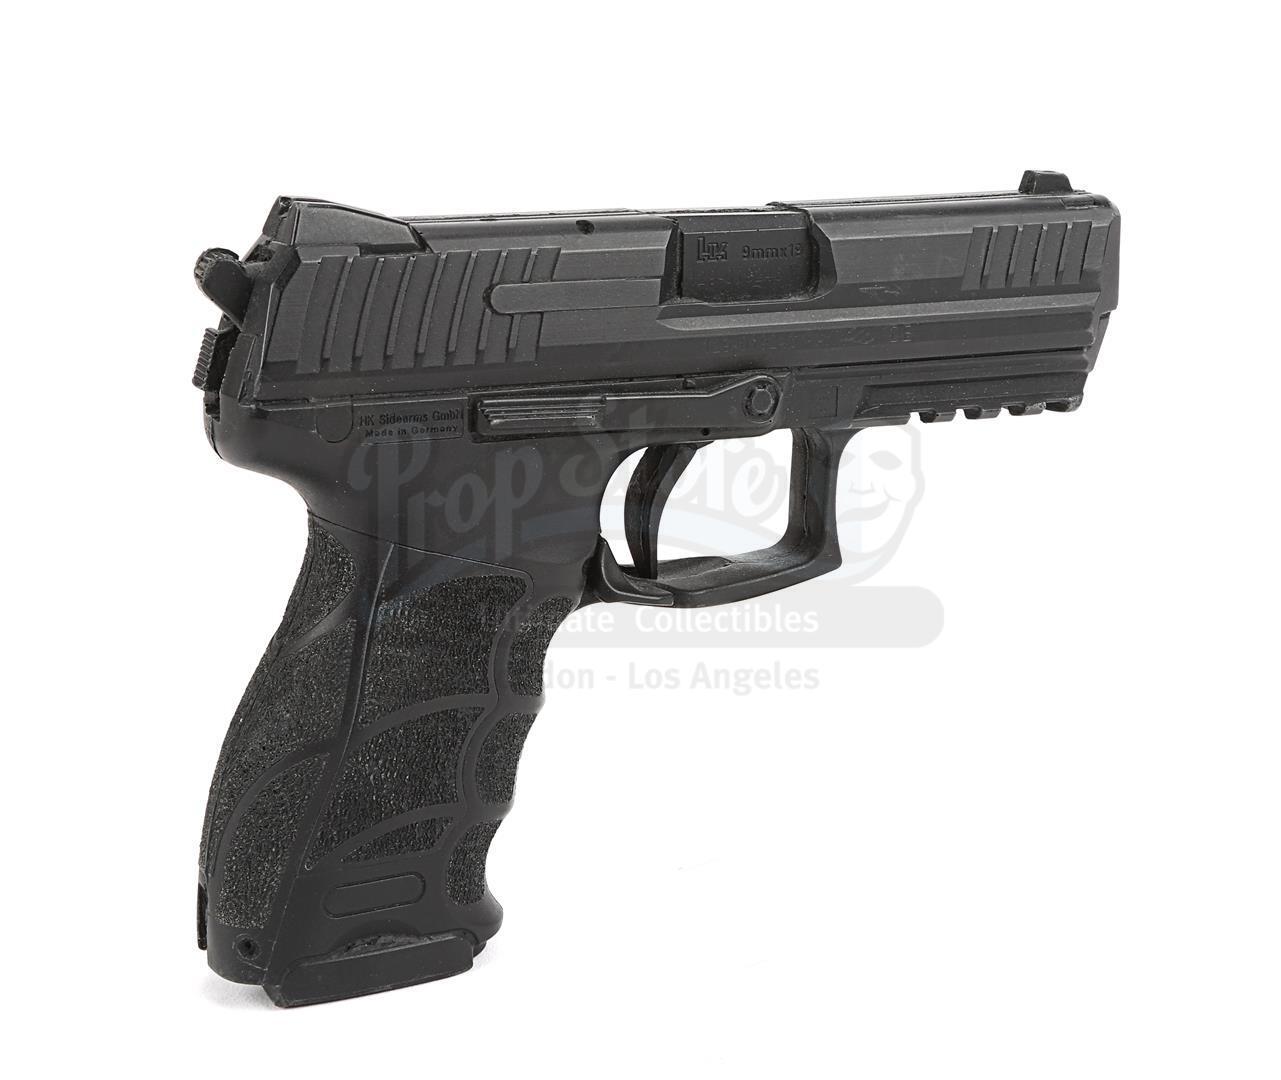 THE AVENGERS (2012) - Hawkeye's (Jeremy Renner) H&K P30 Stunt Pistol - Image 5 of 10